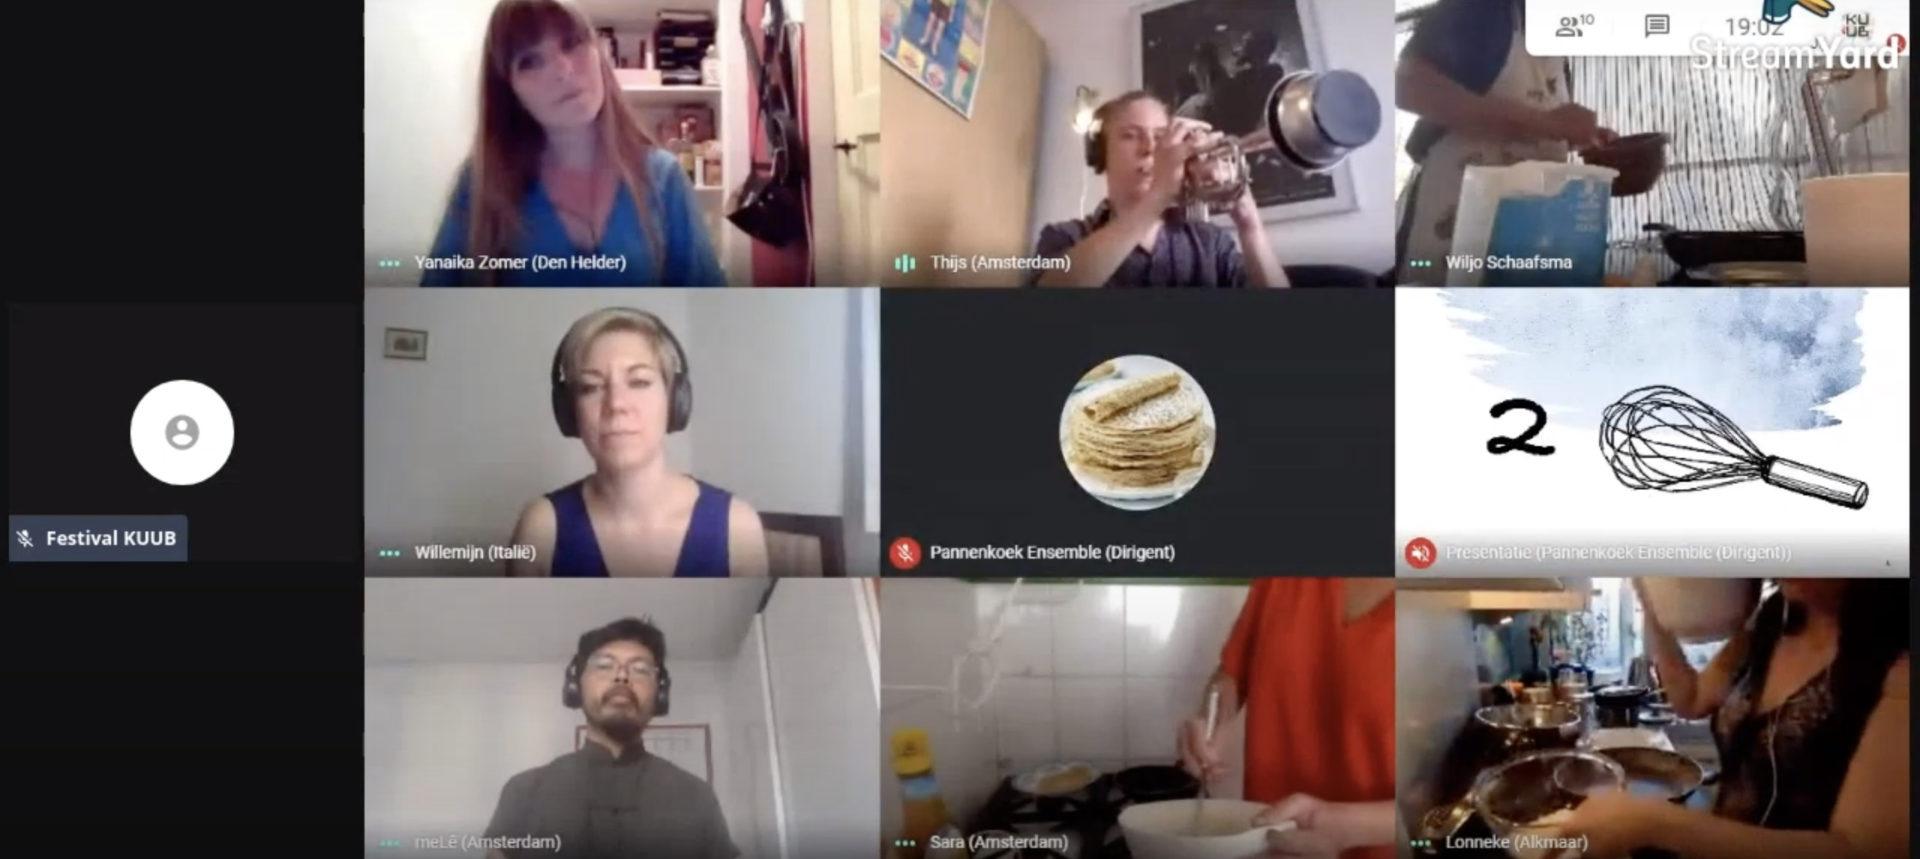 Pannenkoek Rondeau Livestream